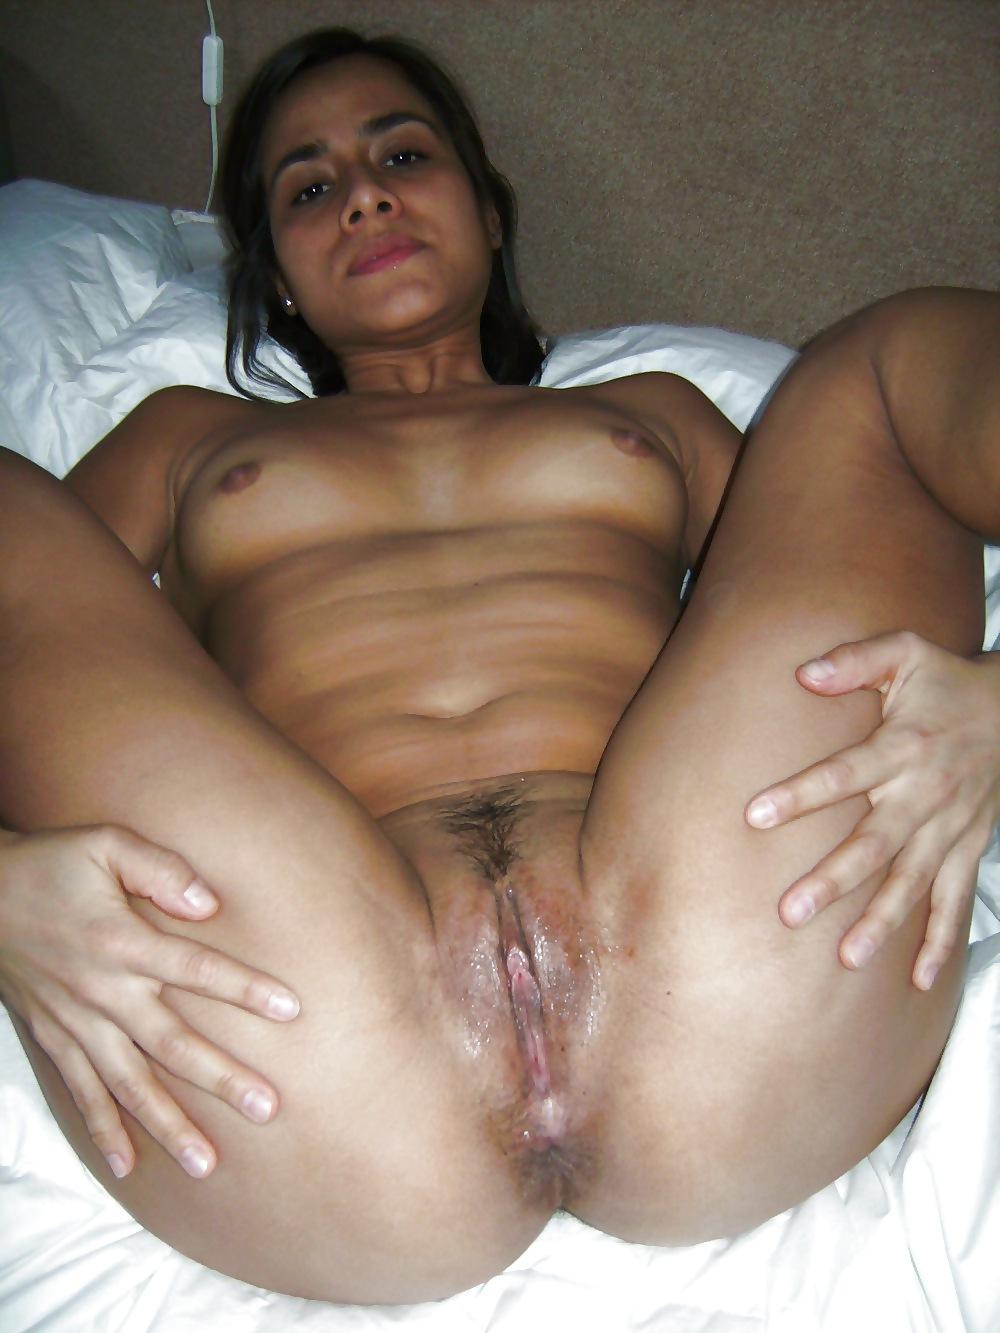 Arabian creampie vagina long labia nude girls pictures